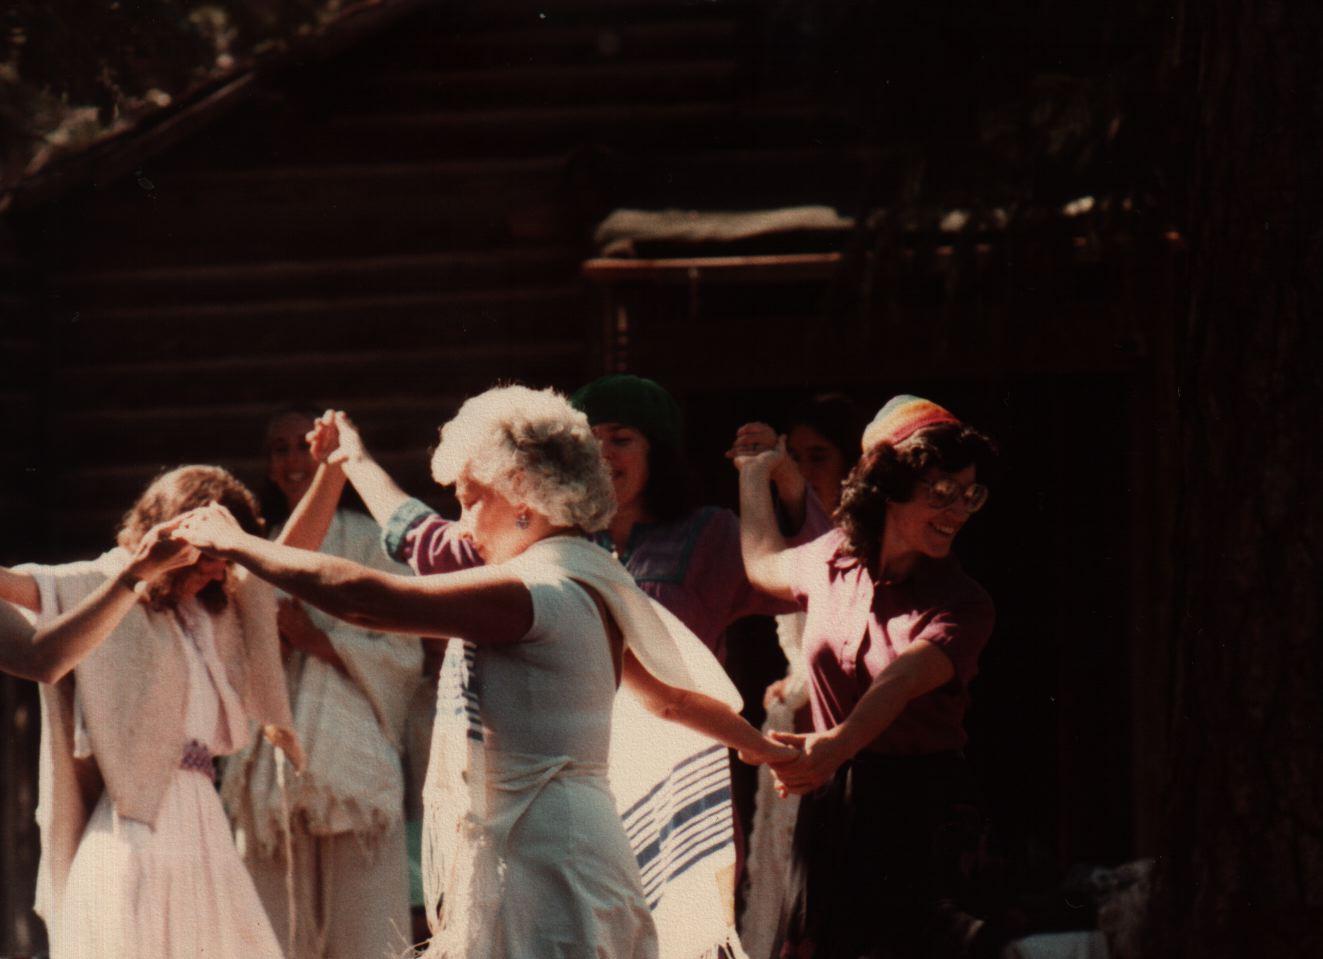 84 Joys  Women dancing, incl Debra De Vries (?), Talma Dinstein, Sharon Alexander, Miriam Jacobs (Yehudit Goldfarb in back) copy.jpg